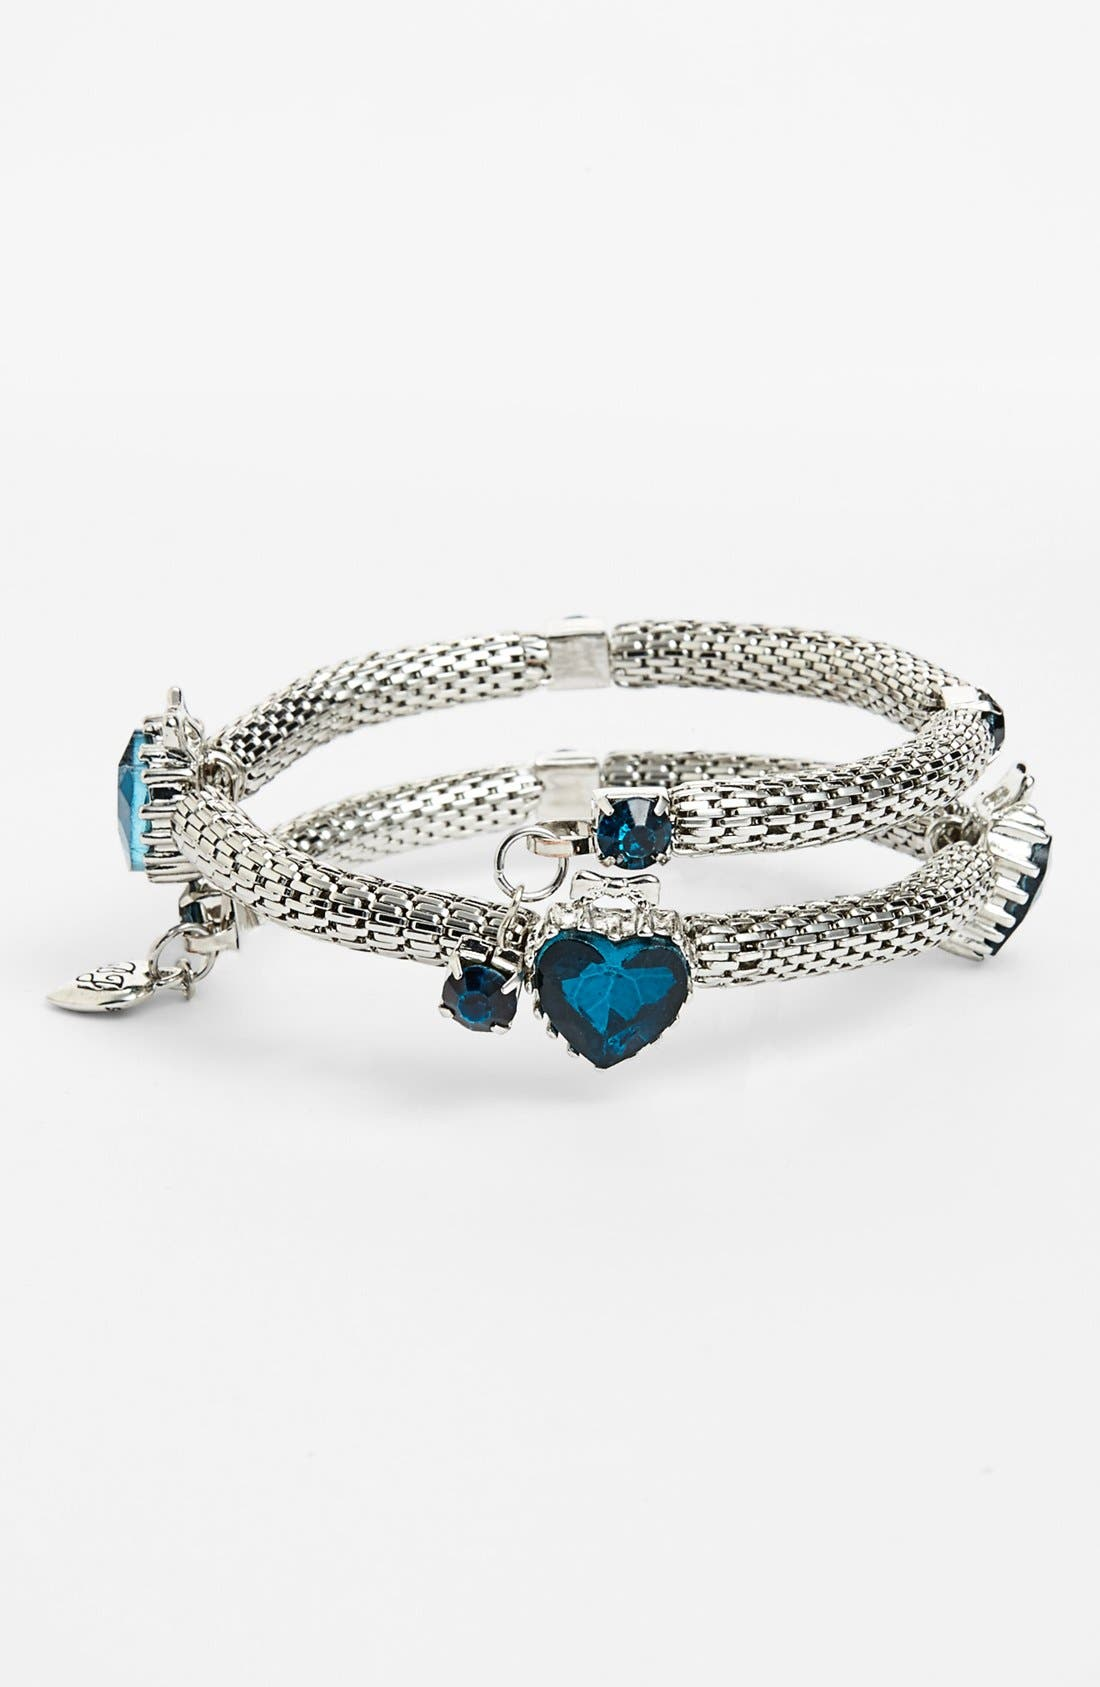 Main Image - Betsey Johnson 'Wear It Where?' Heart Coil Bracelet